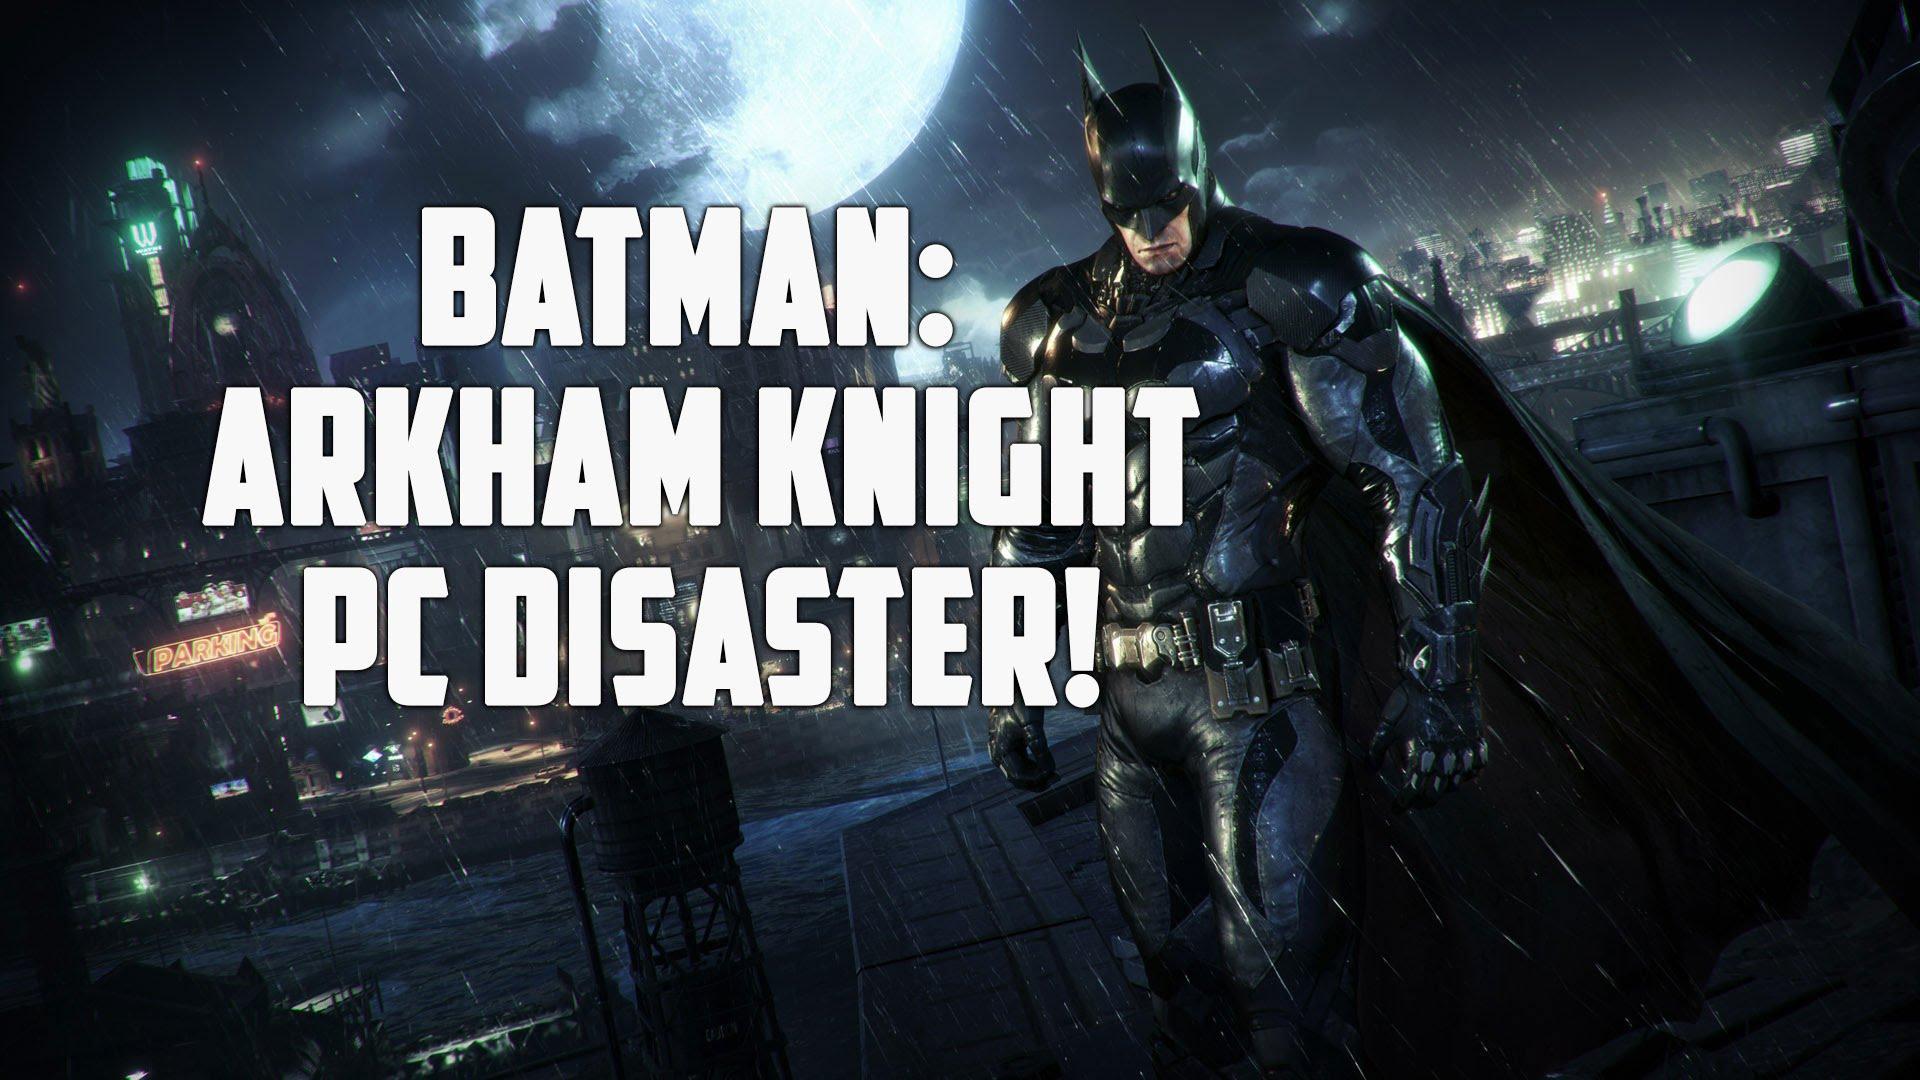 Batman Arkham Knight desastre en Pc EGLA